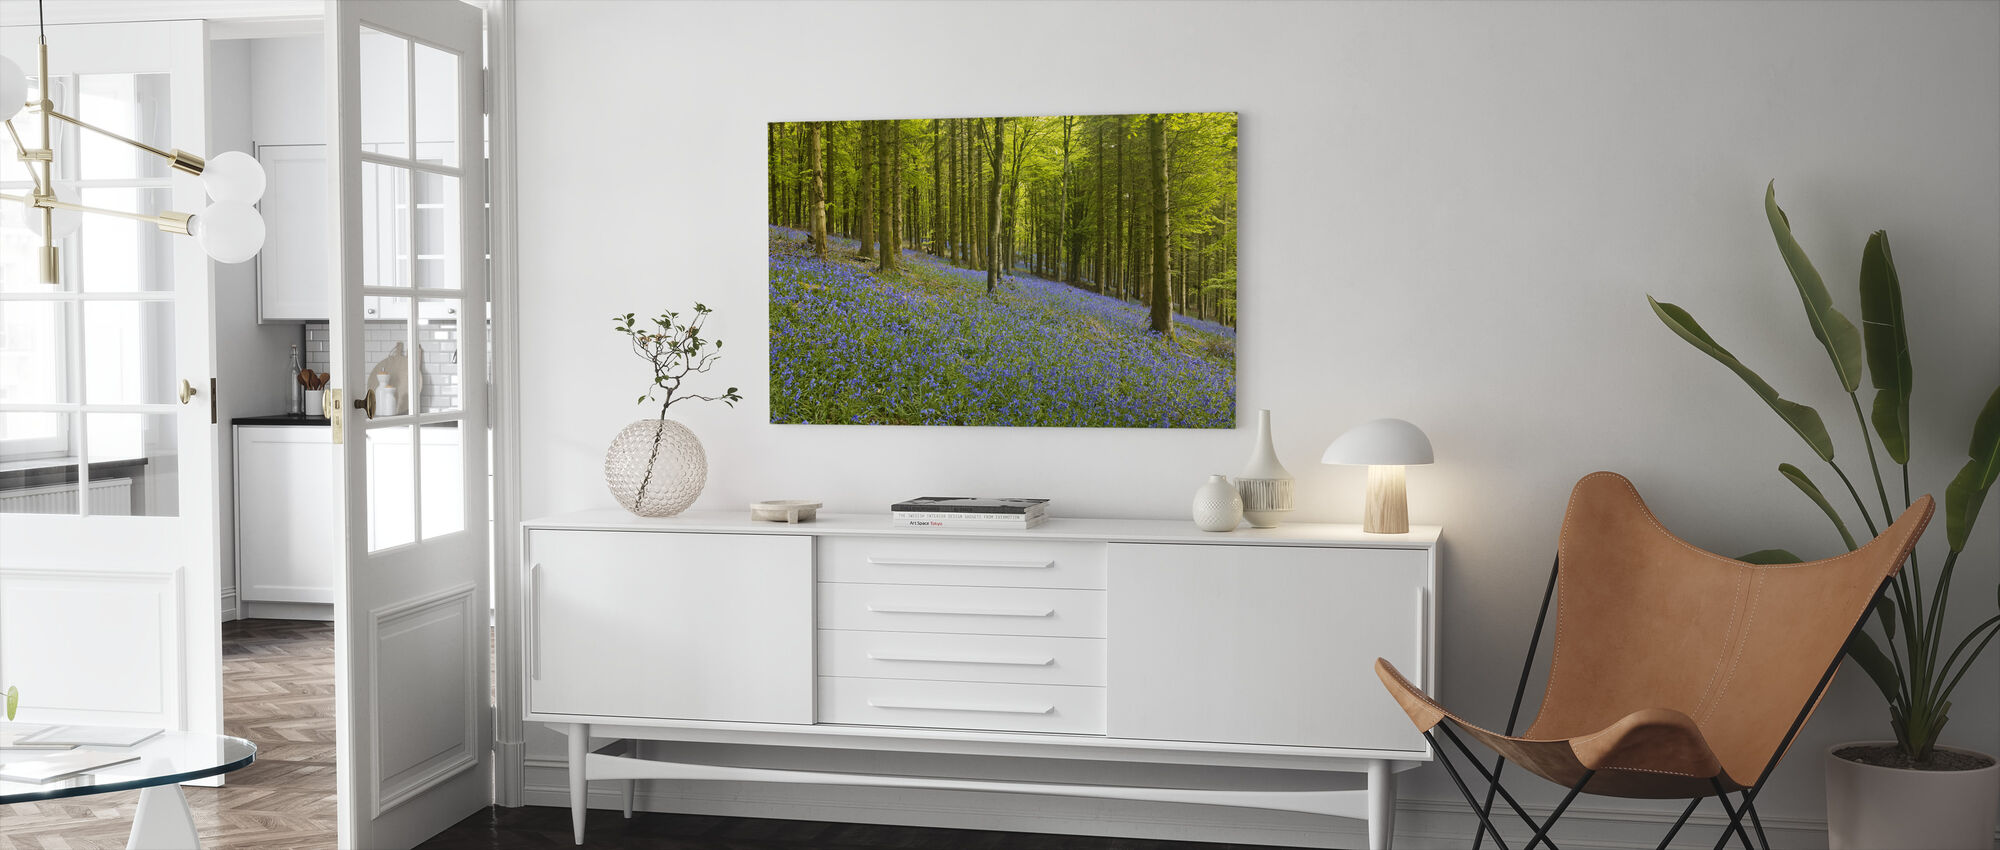 Bluebell Vloer van Delcombe Hout - Canvas print - Woonkamer